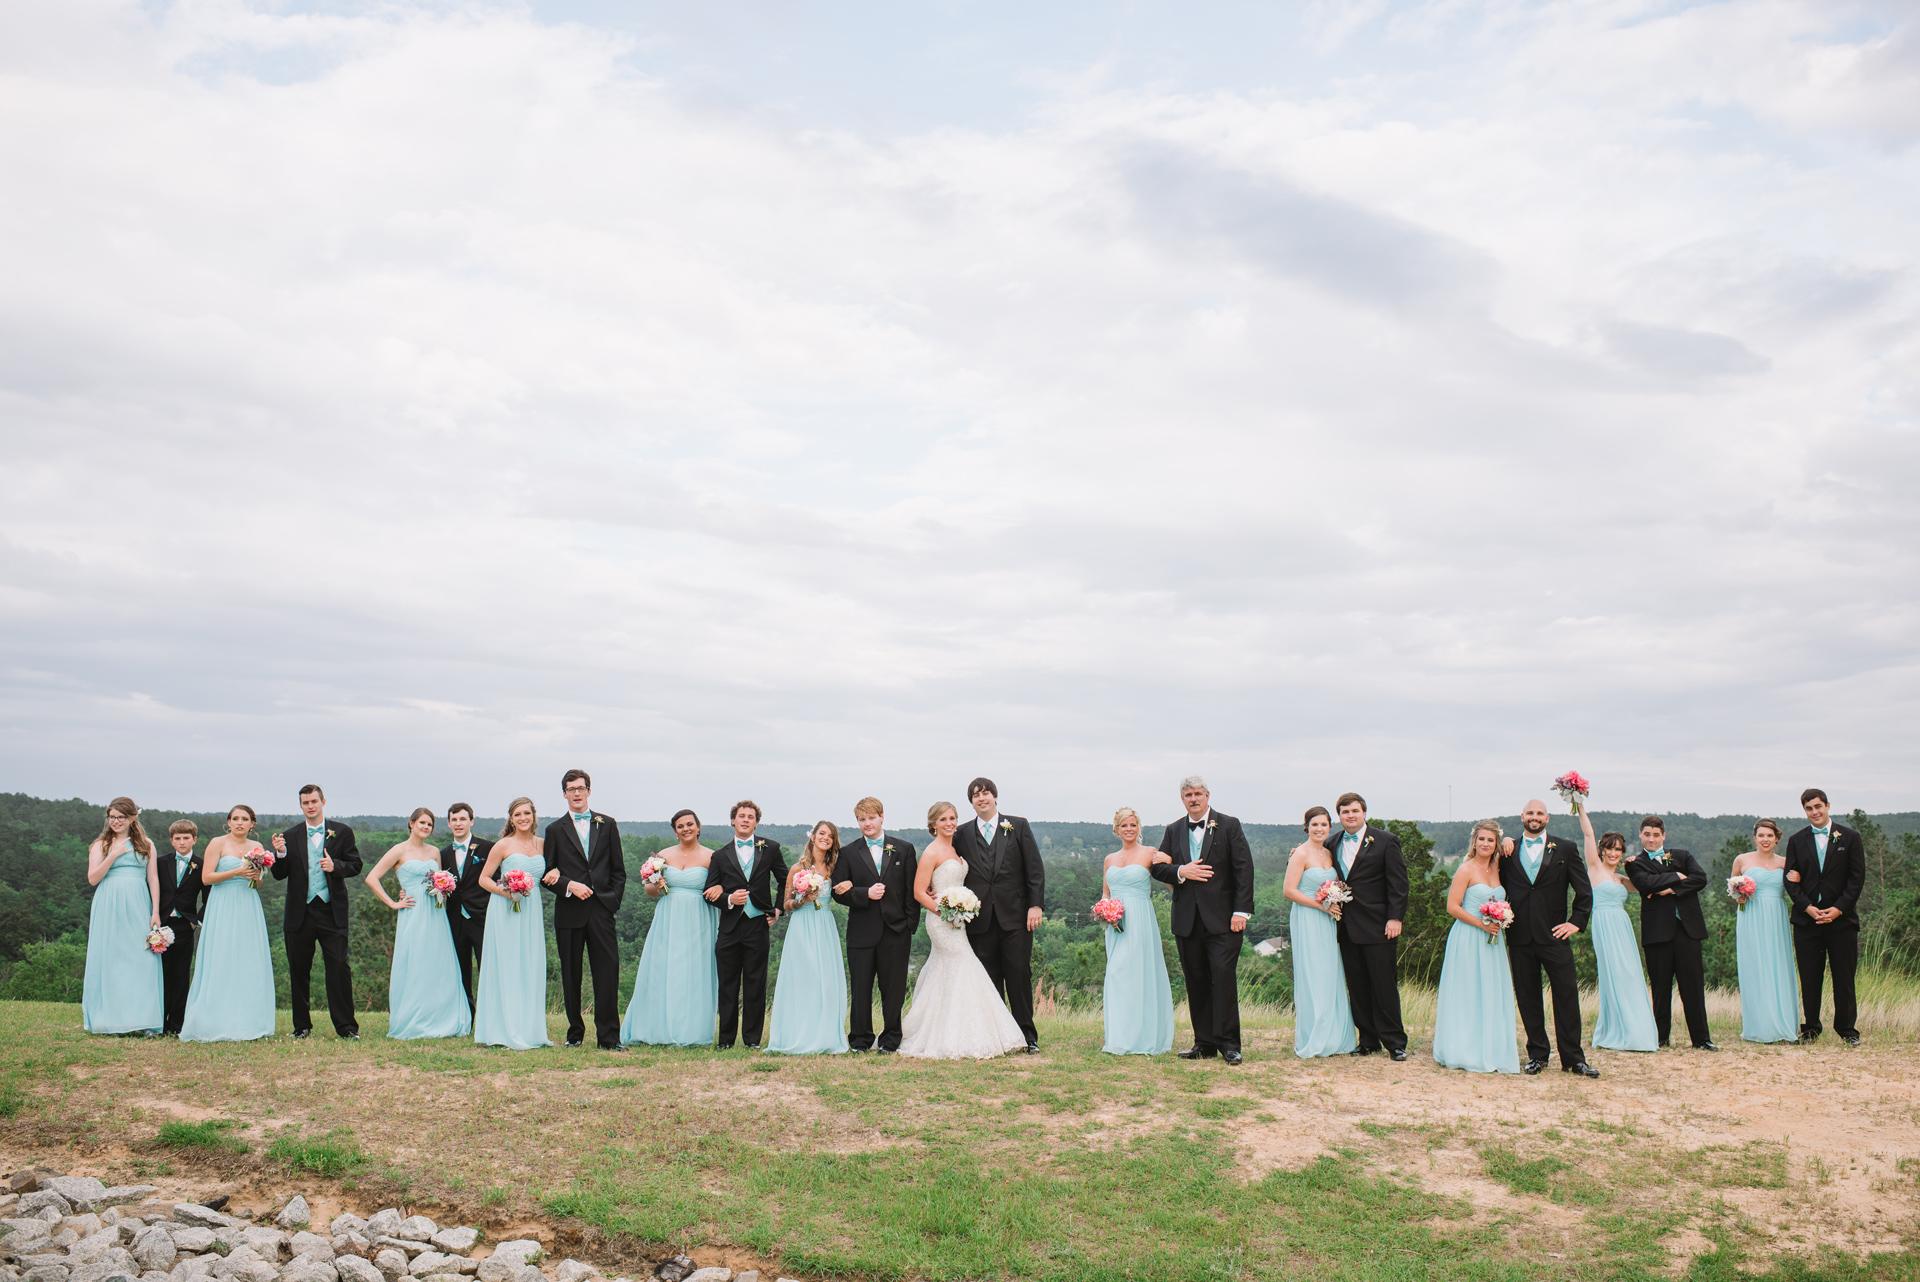 jenna-michael-wedding-sage-valley-augusta-ga